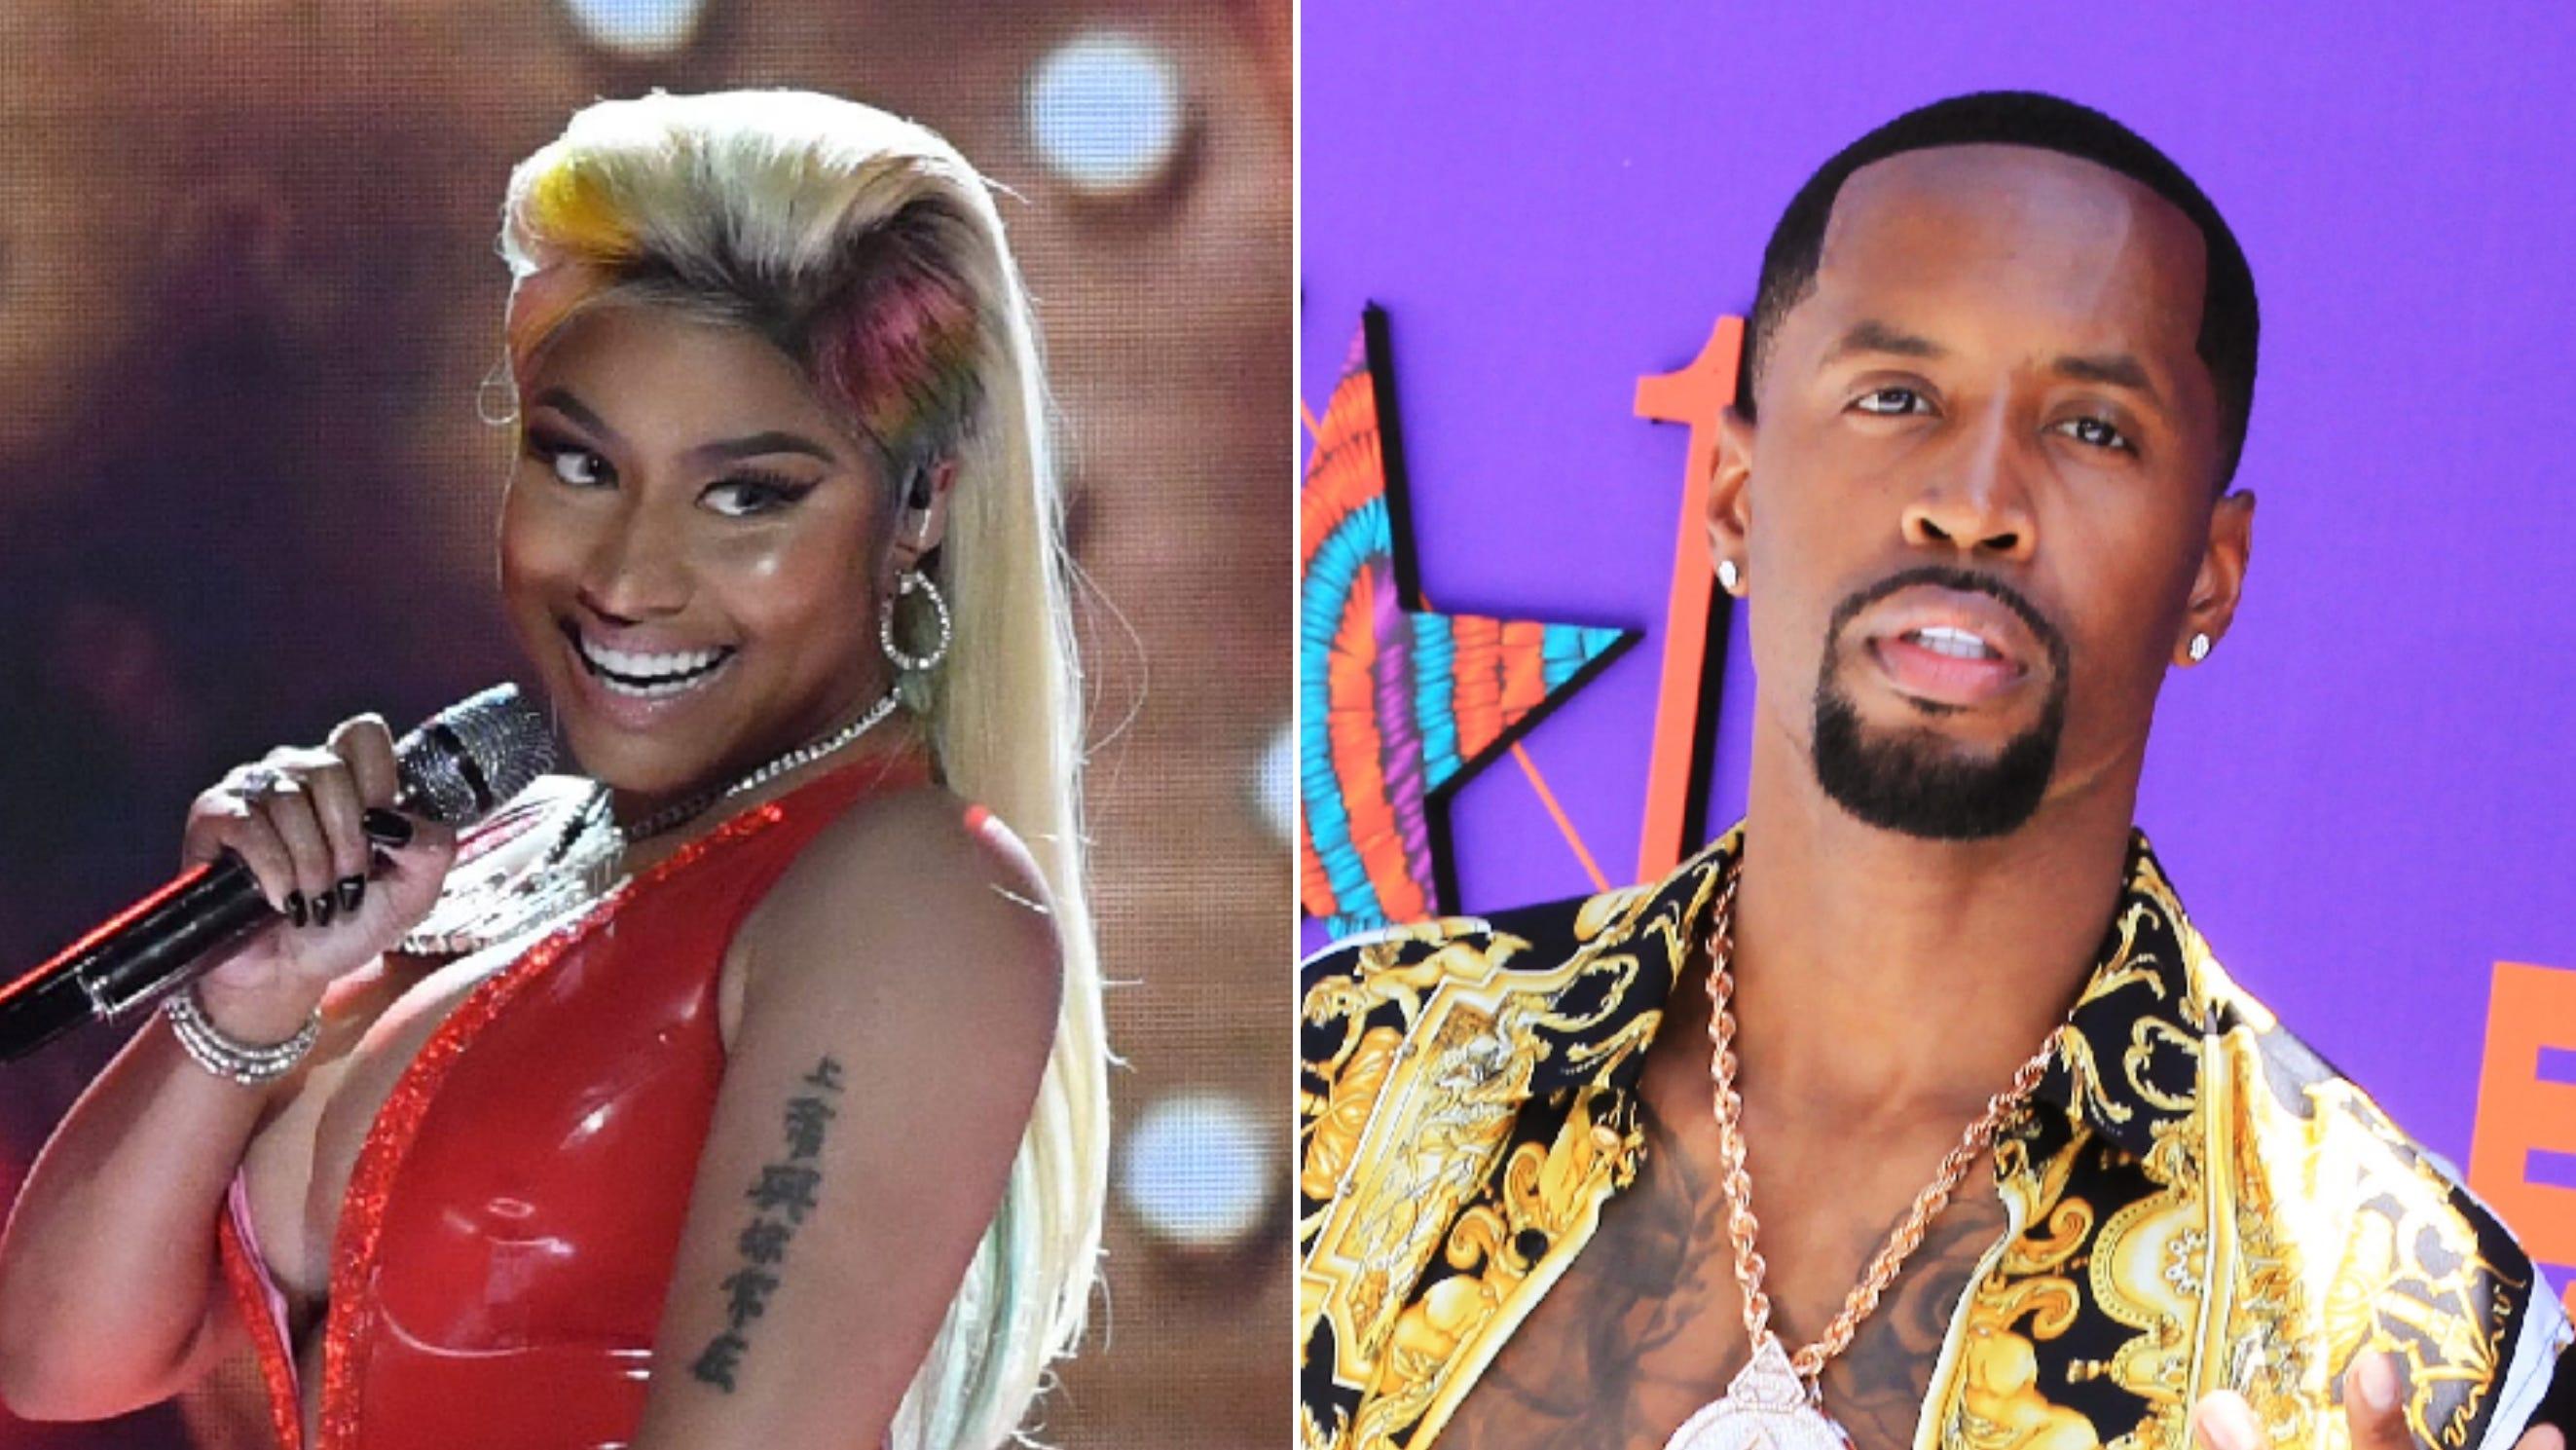 Nicki Minaj ex Safaree feud on Twitter he says she assaulted him